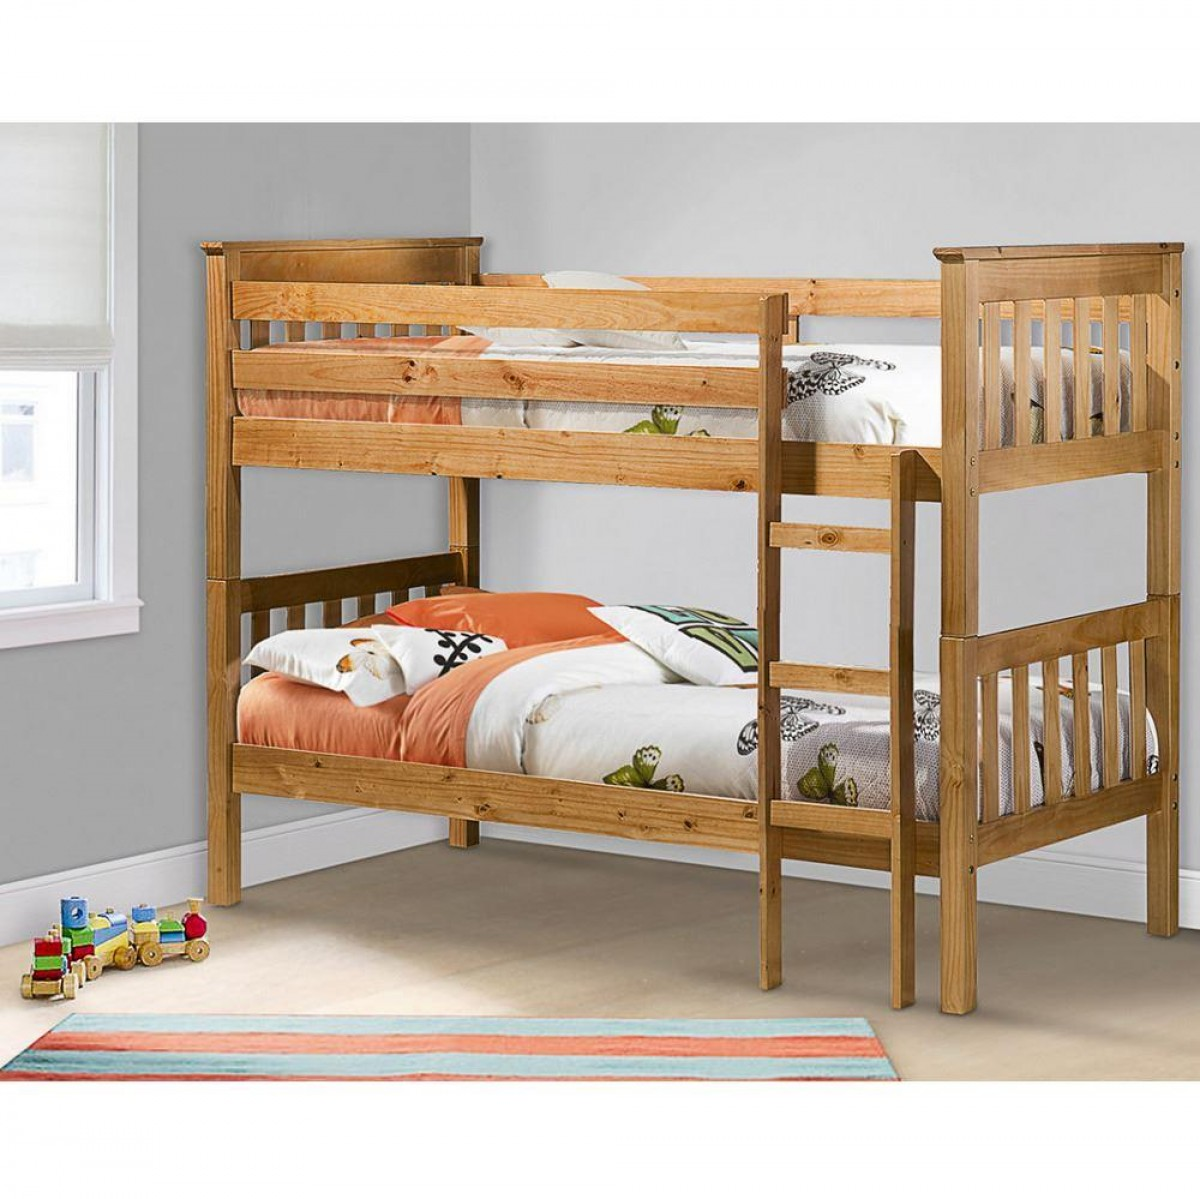 Portland Pine Wooden Bunk Bed